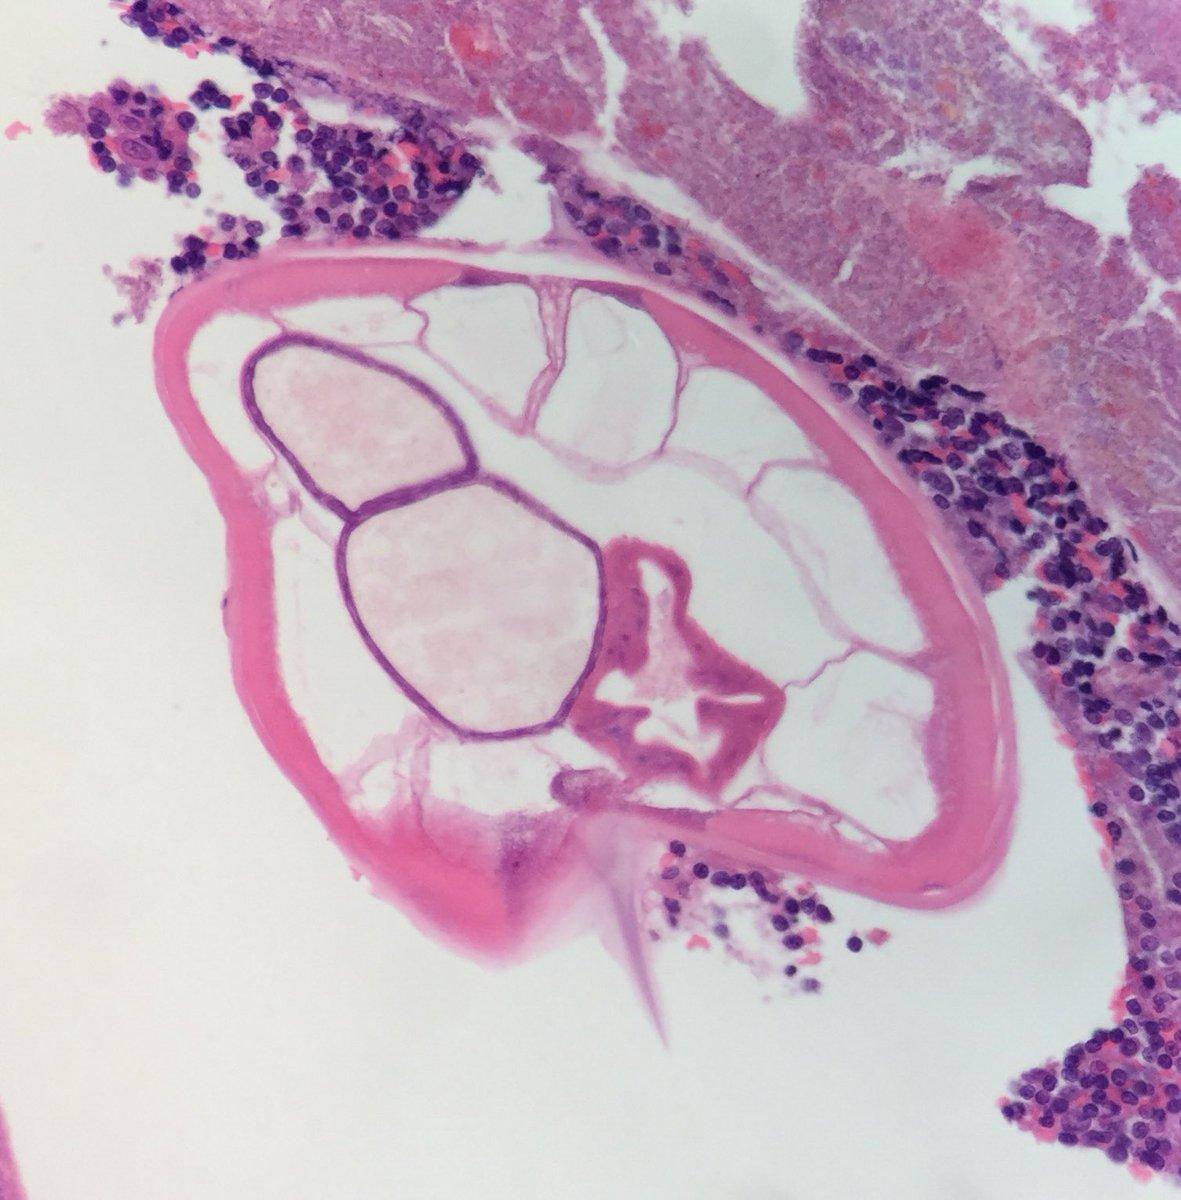 enterobius vermicularis histology papillomatosis websters